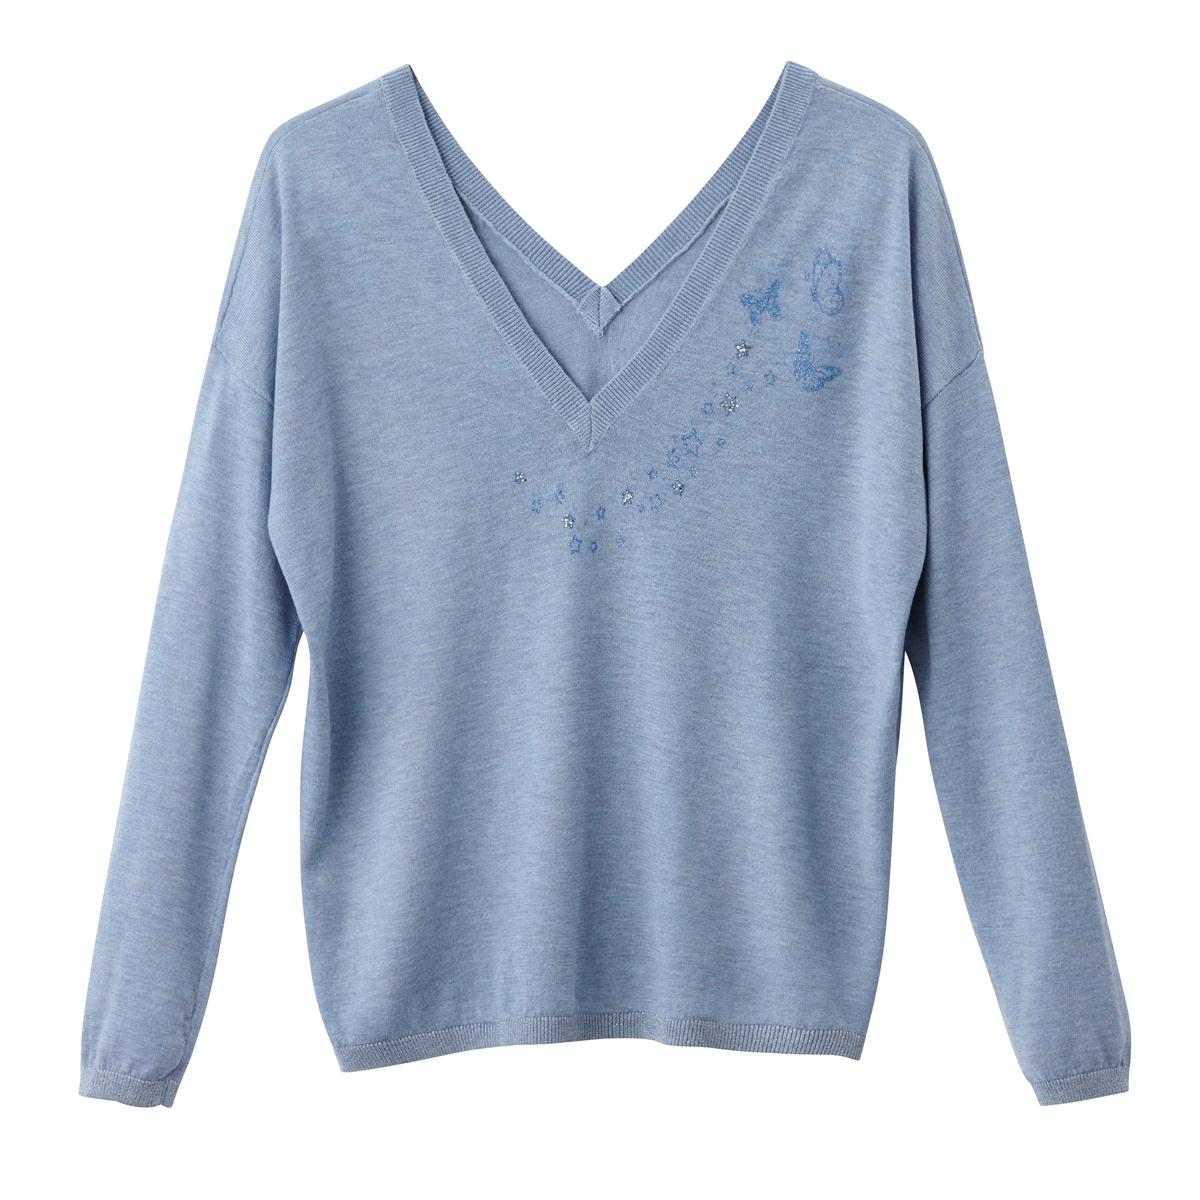 Пуловер из тонкого трикотажа с разрезом на круглом вырезе